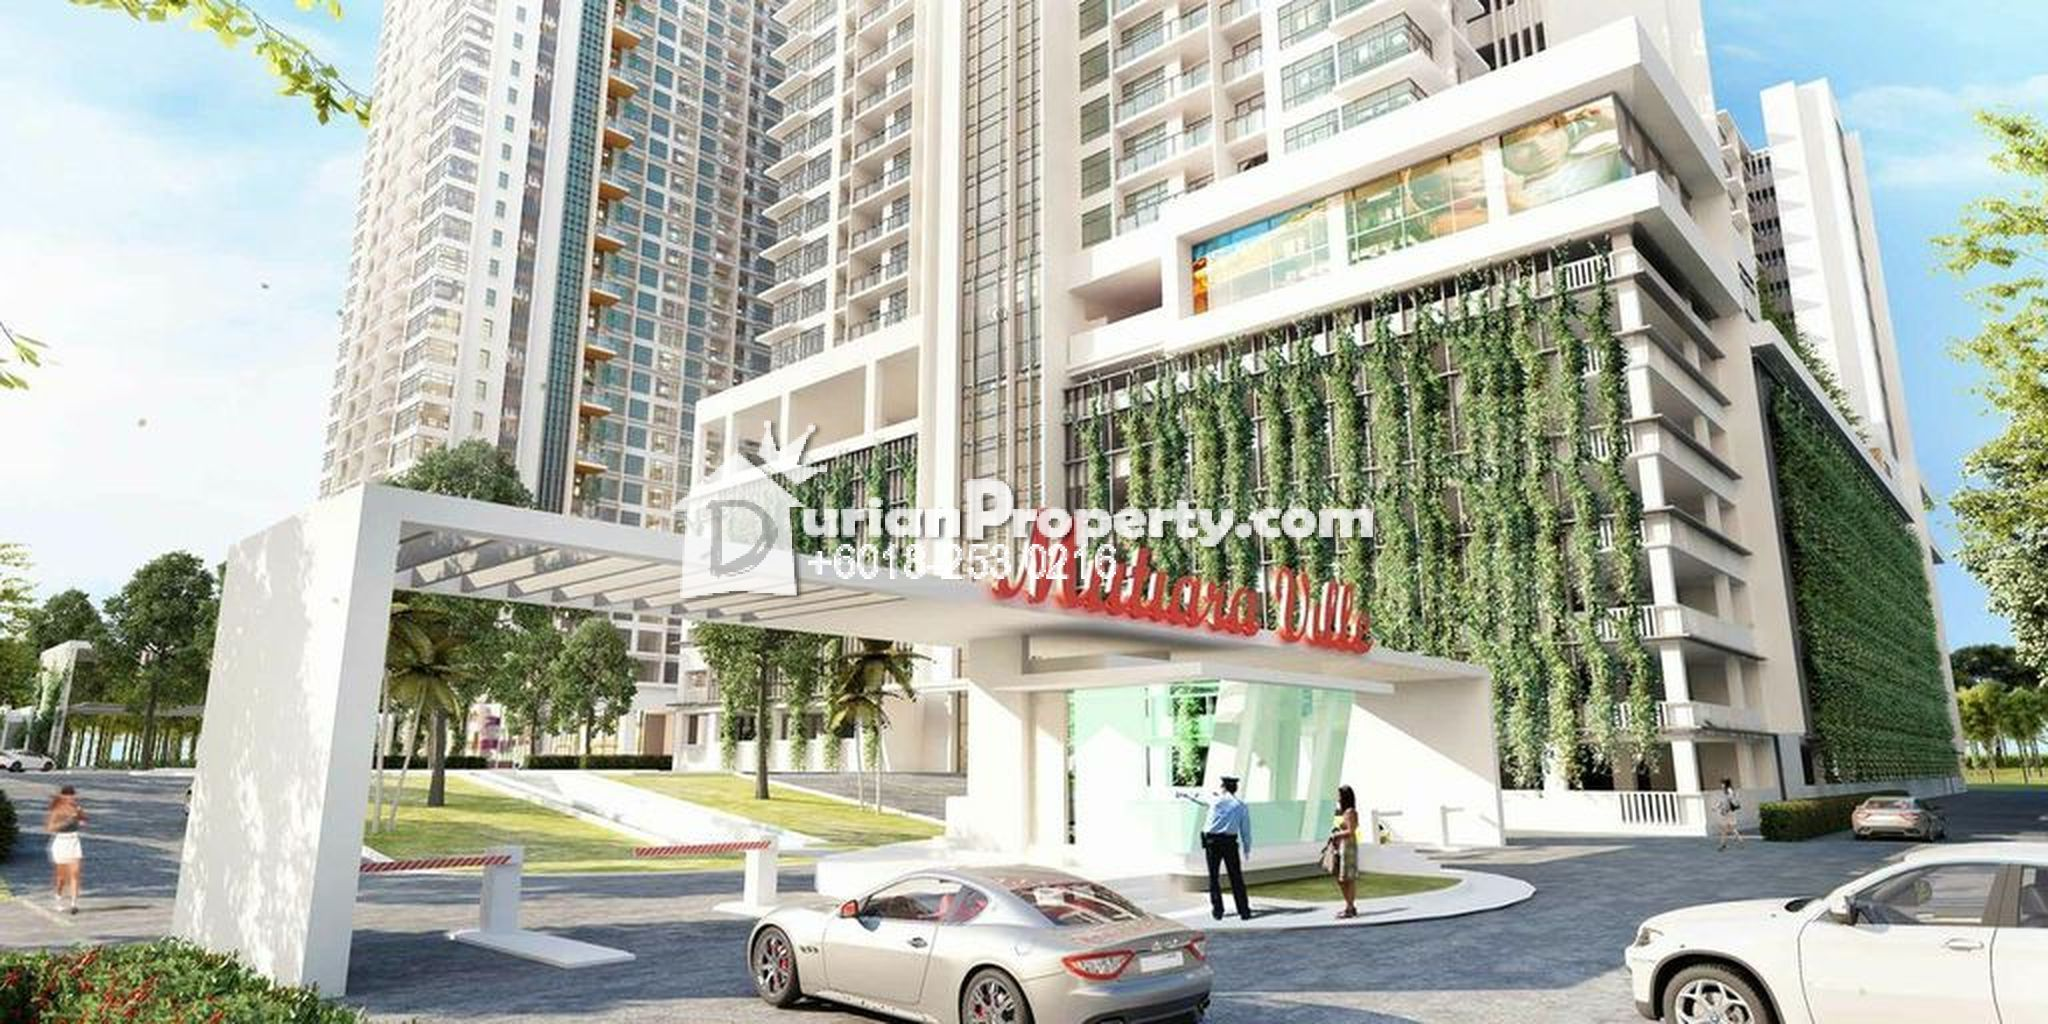 Condo For Sale At Mutiara Ville Cyberjaya For Rm450000 By Rex Durianproperty Condominium Entrance Entrance Design Condos For Sale